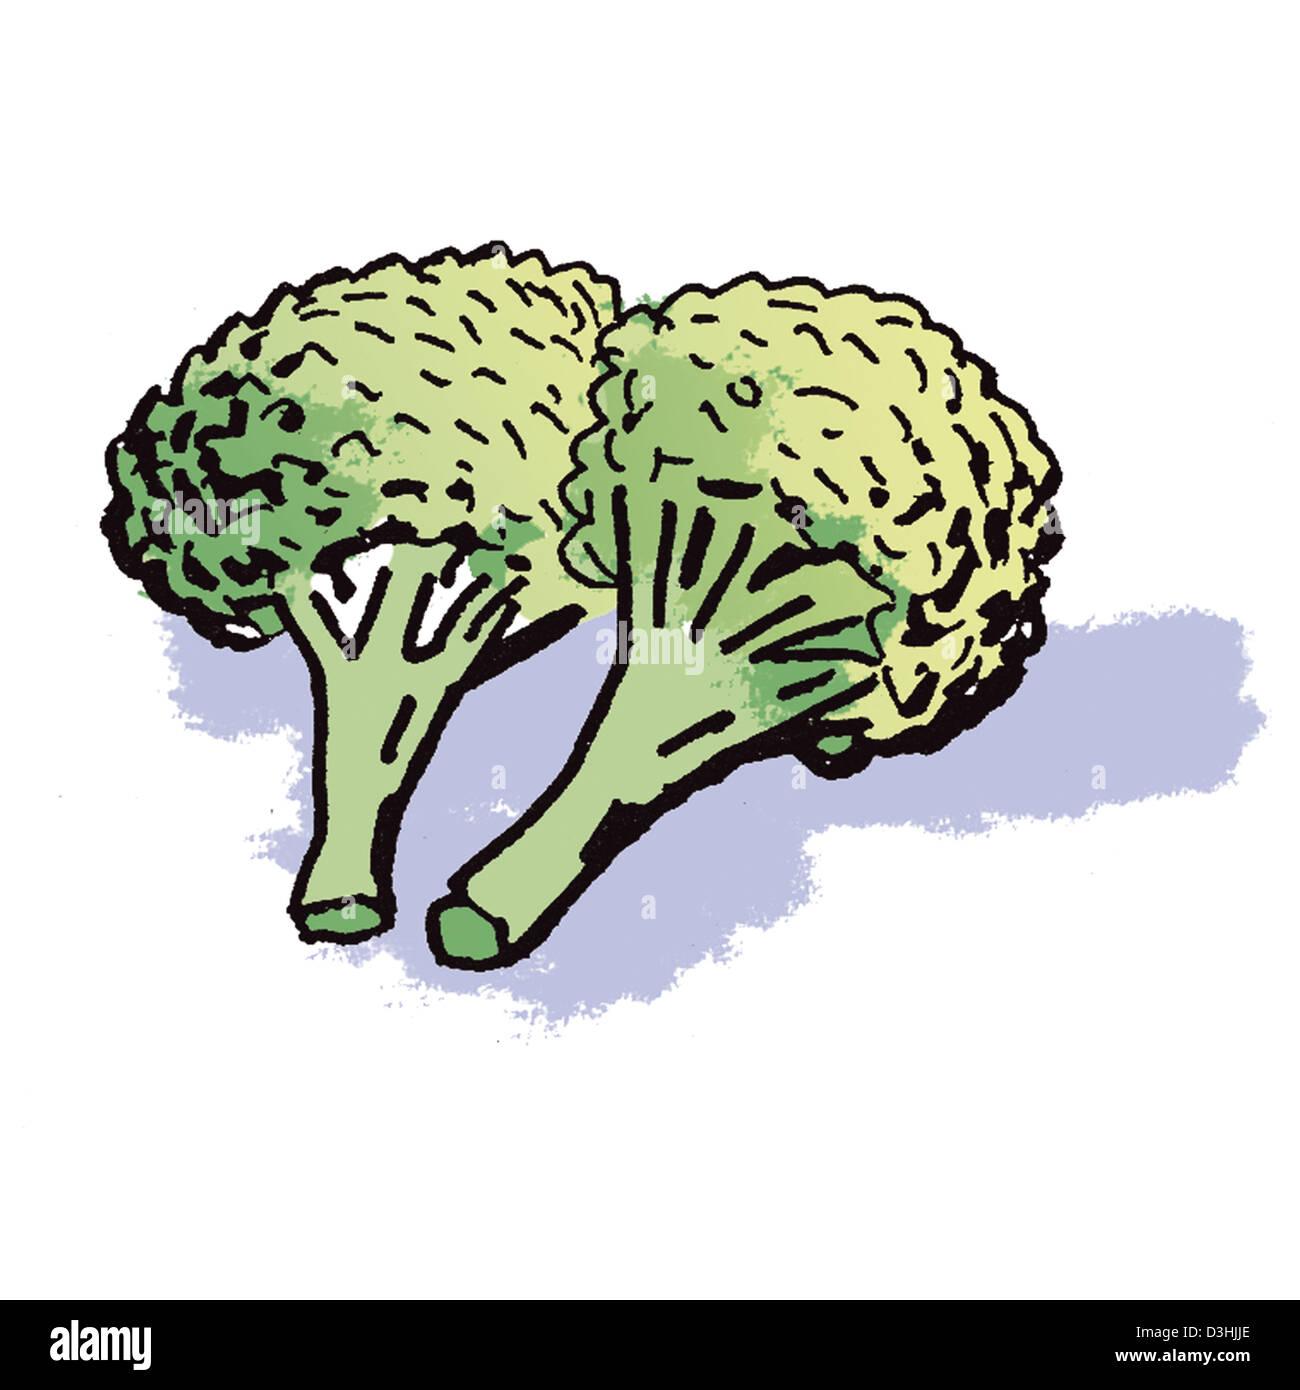 broccoli drawing stock photo royalty free image 53862886 alamy